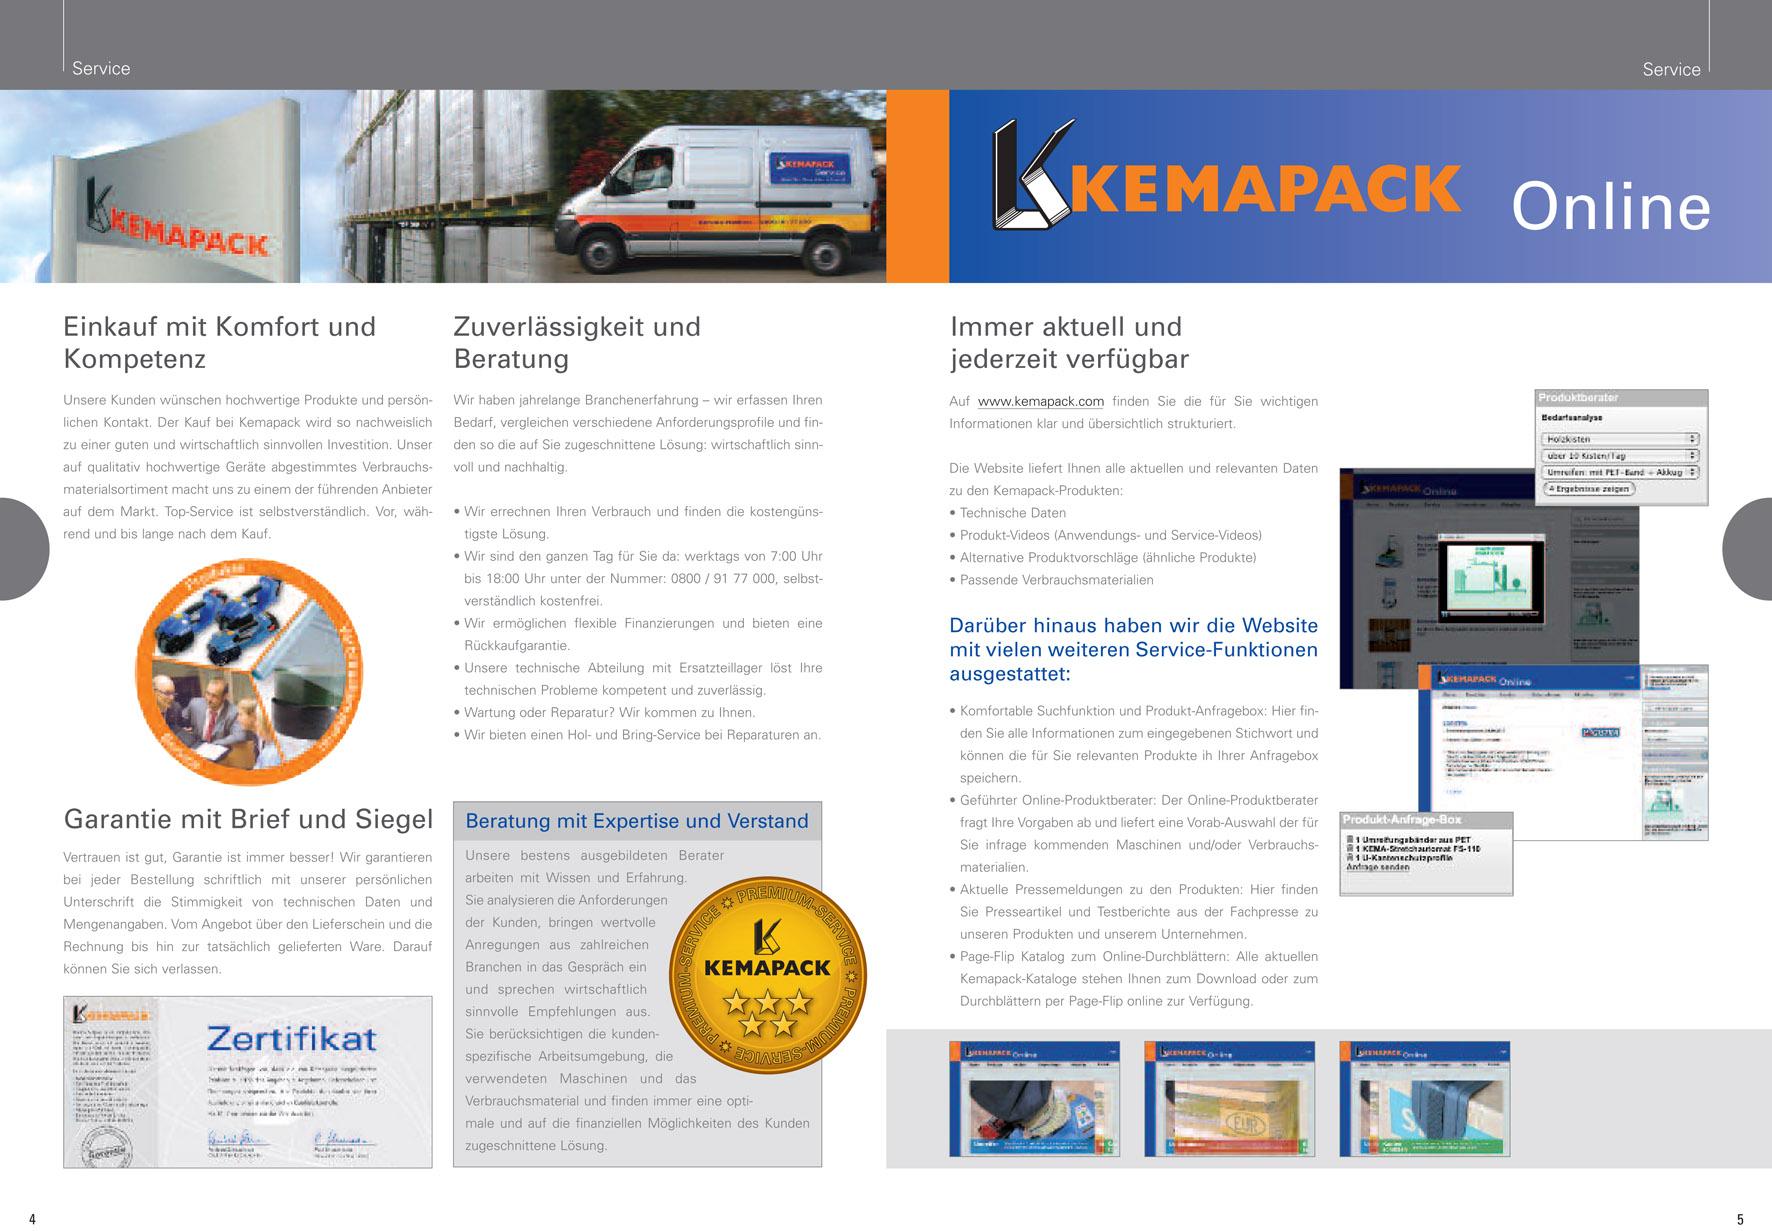 2 KP Katalog 2011 Service